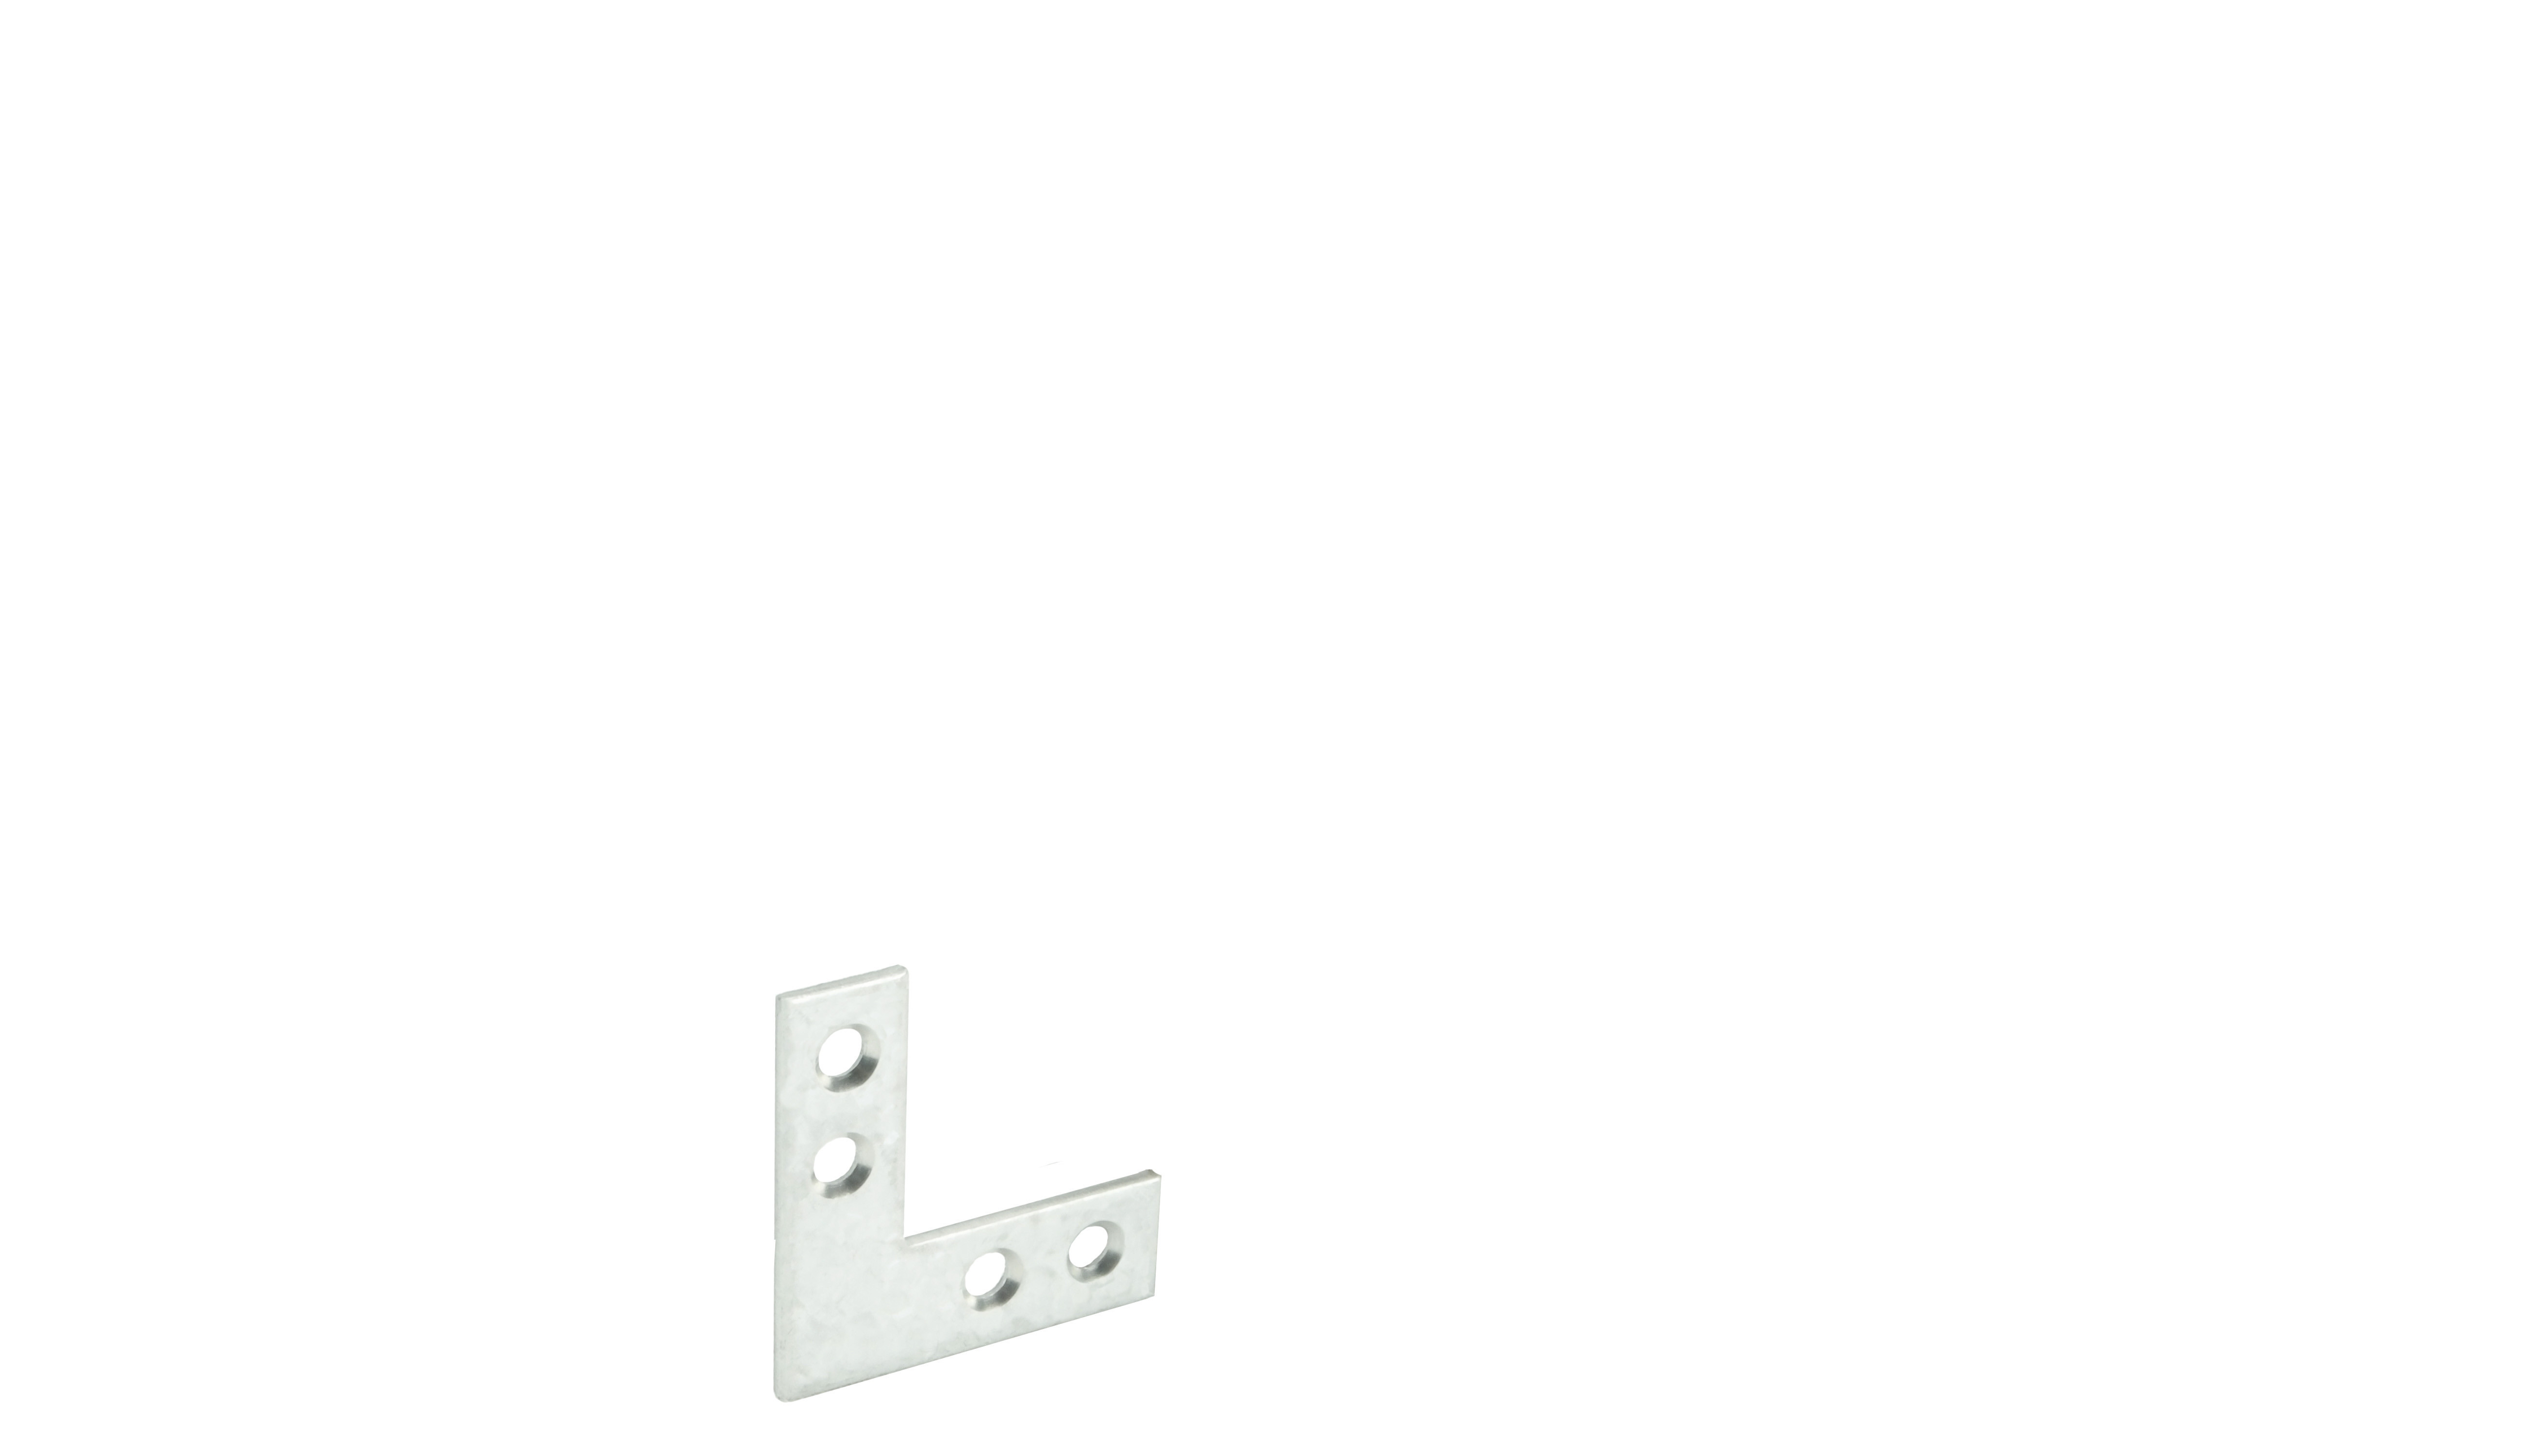 Flat corner iron flat 30x30 10x1,5 GA